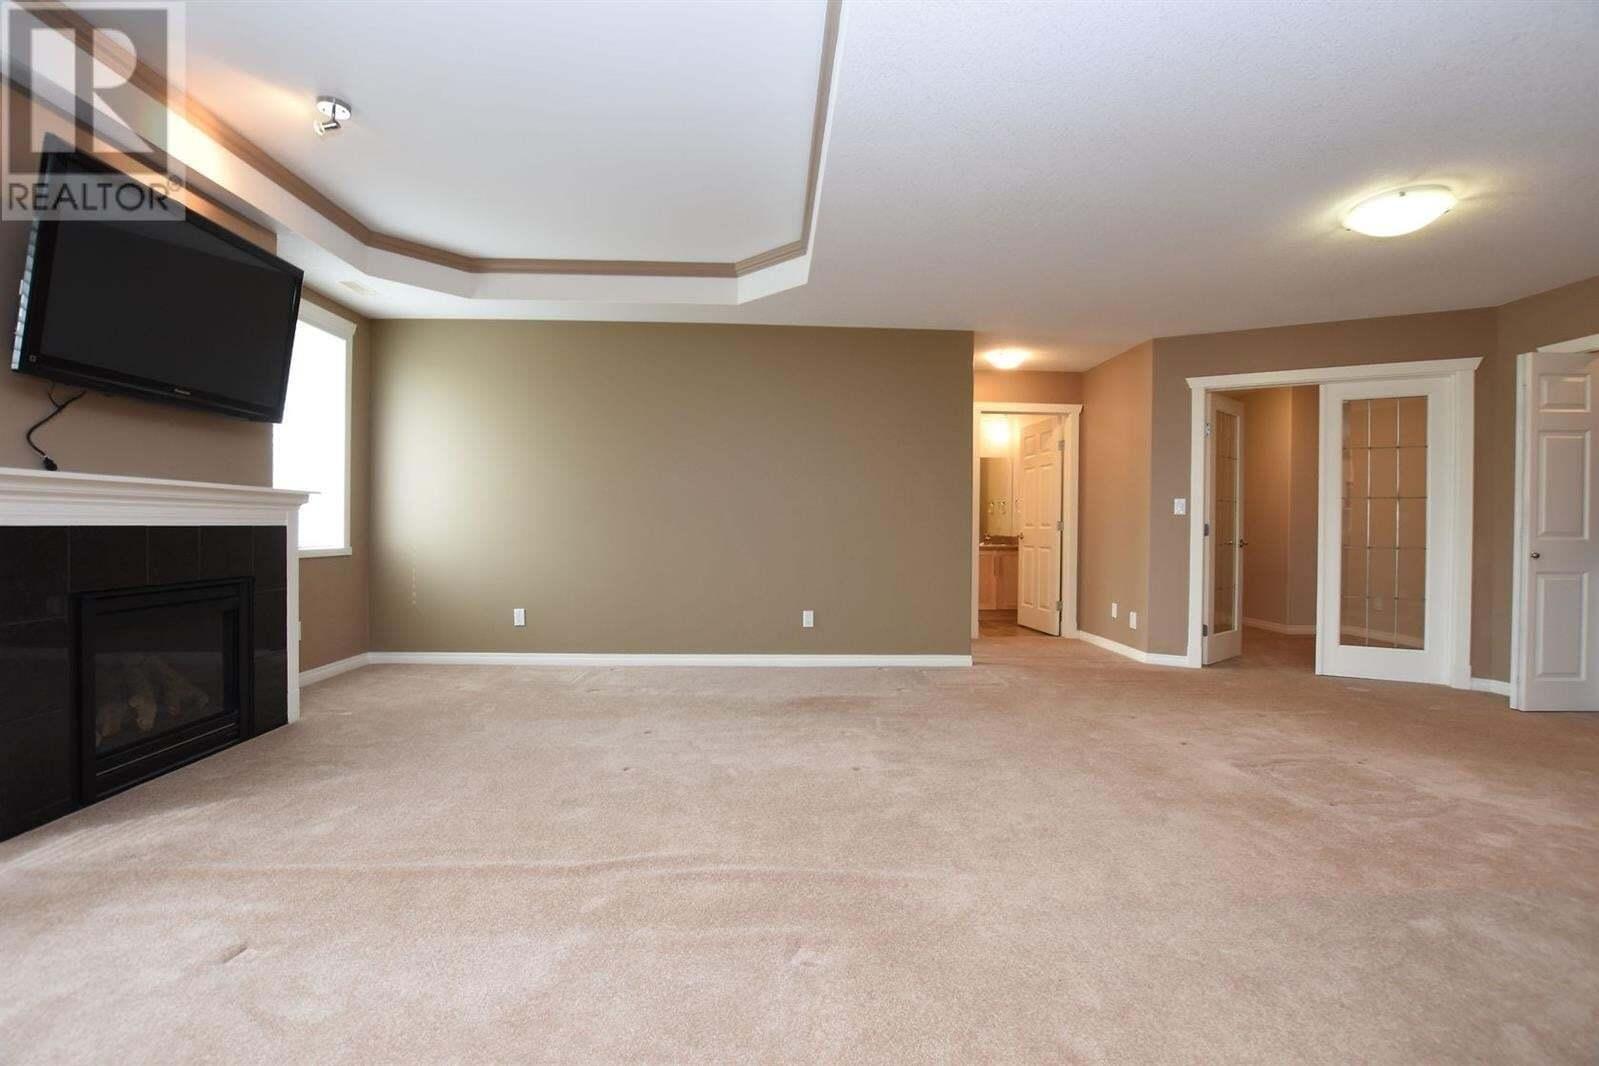 Condo for sale at 5 2nd Ave E Unit 6B Lumsden Saskatchewan - MLS: SK809967